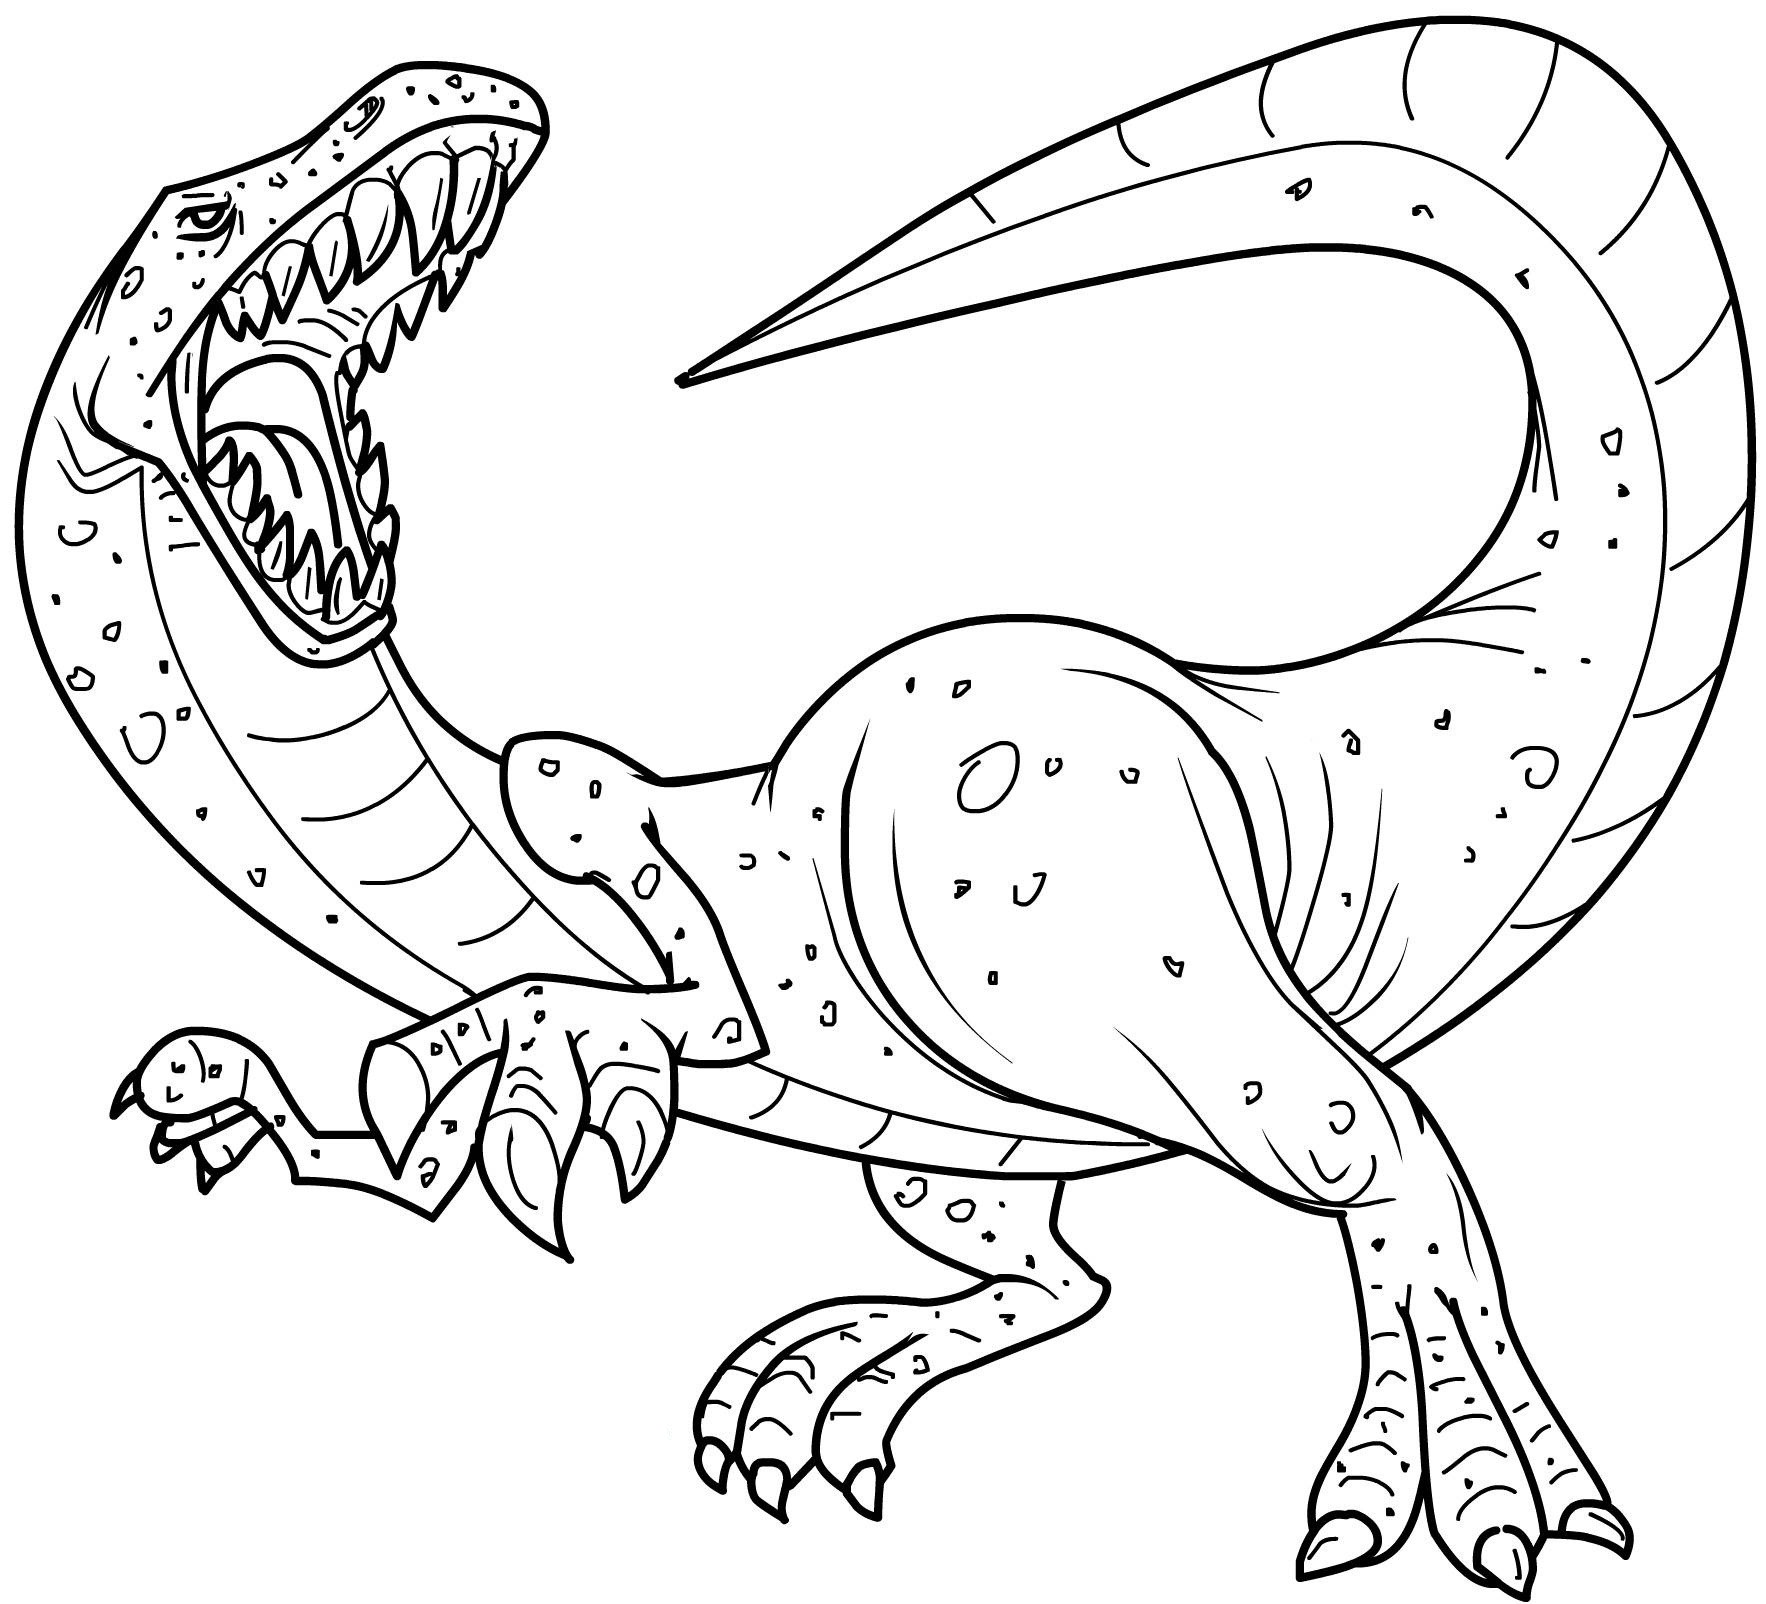 Coloriage dinosaure imprimer gratuit